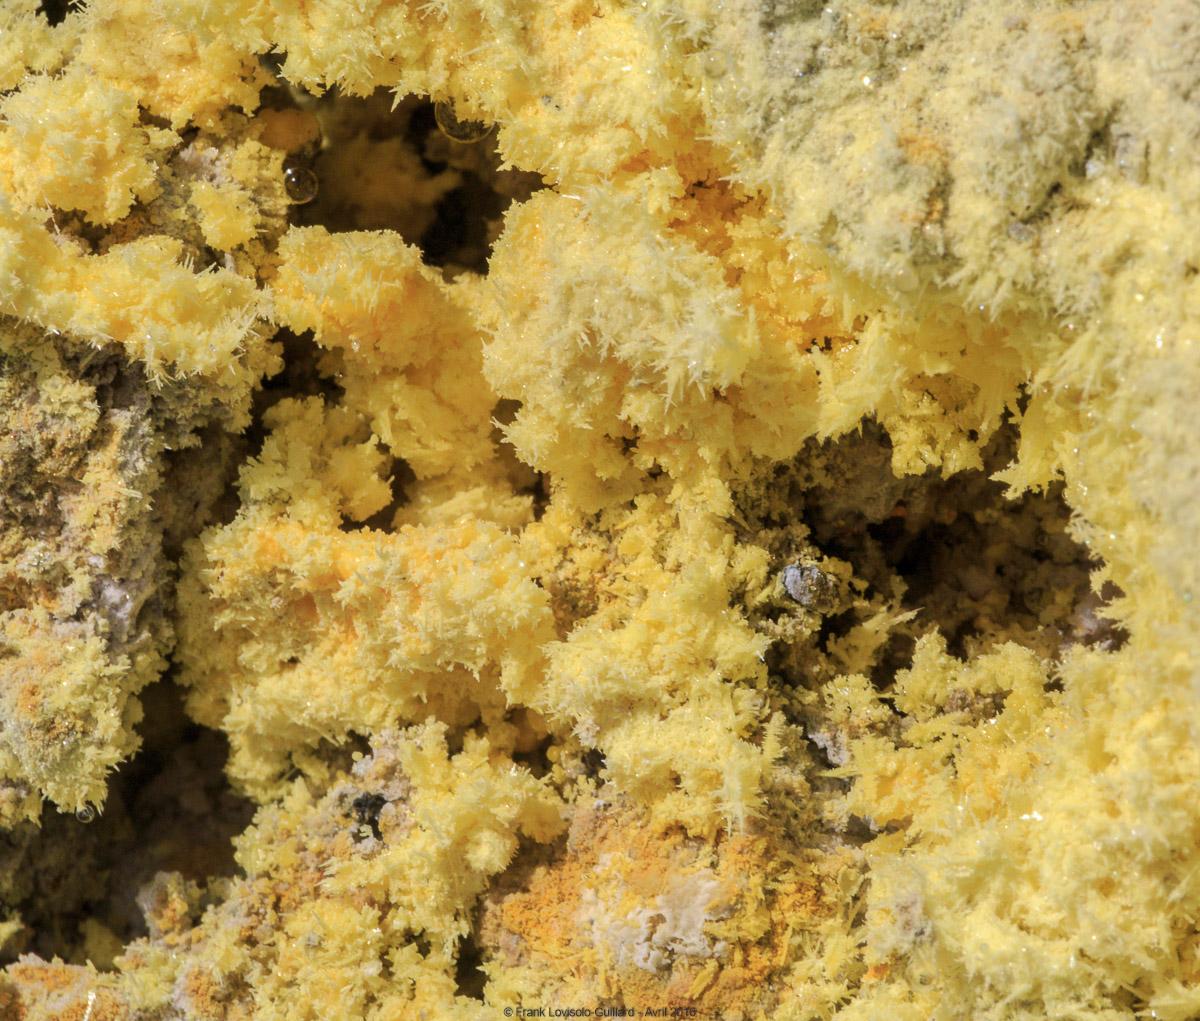 vulcano cristaux 050